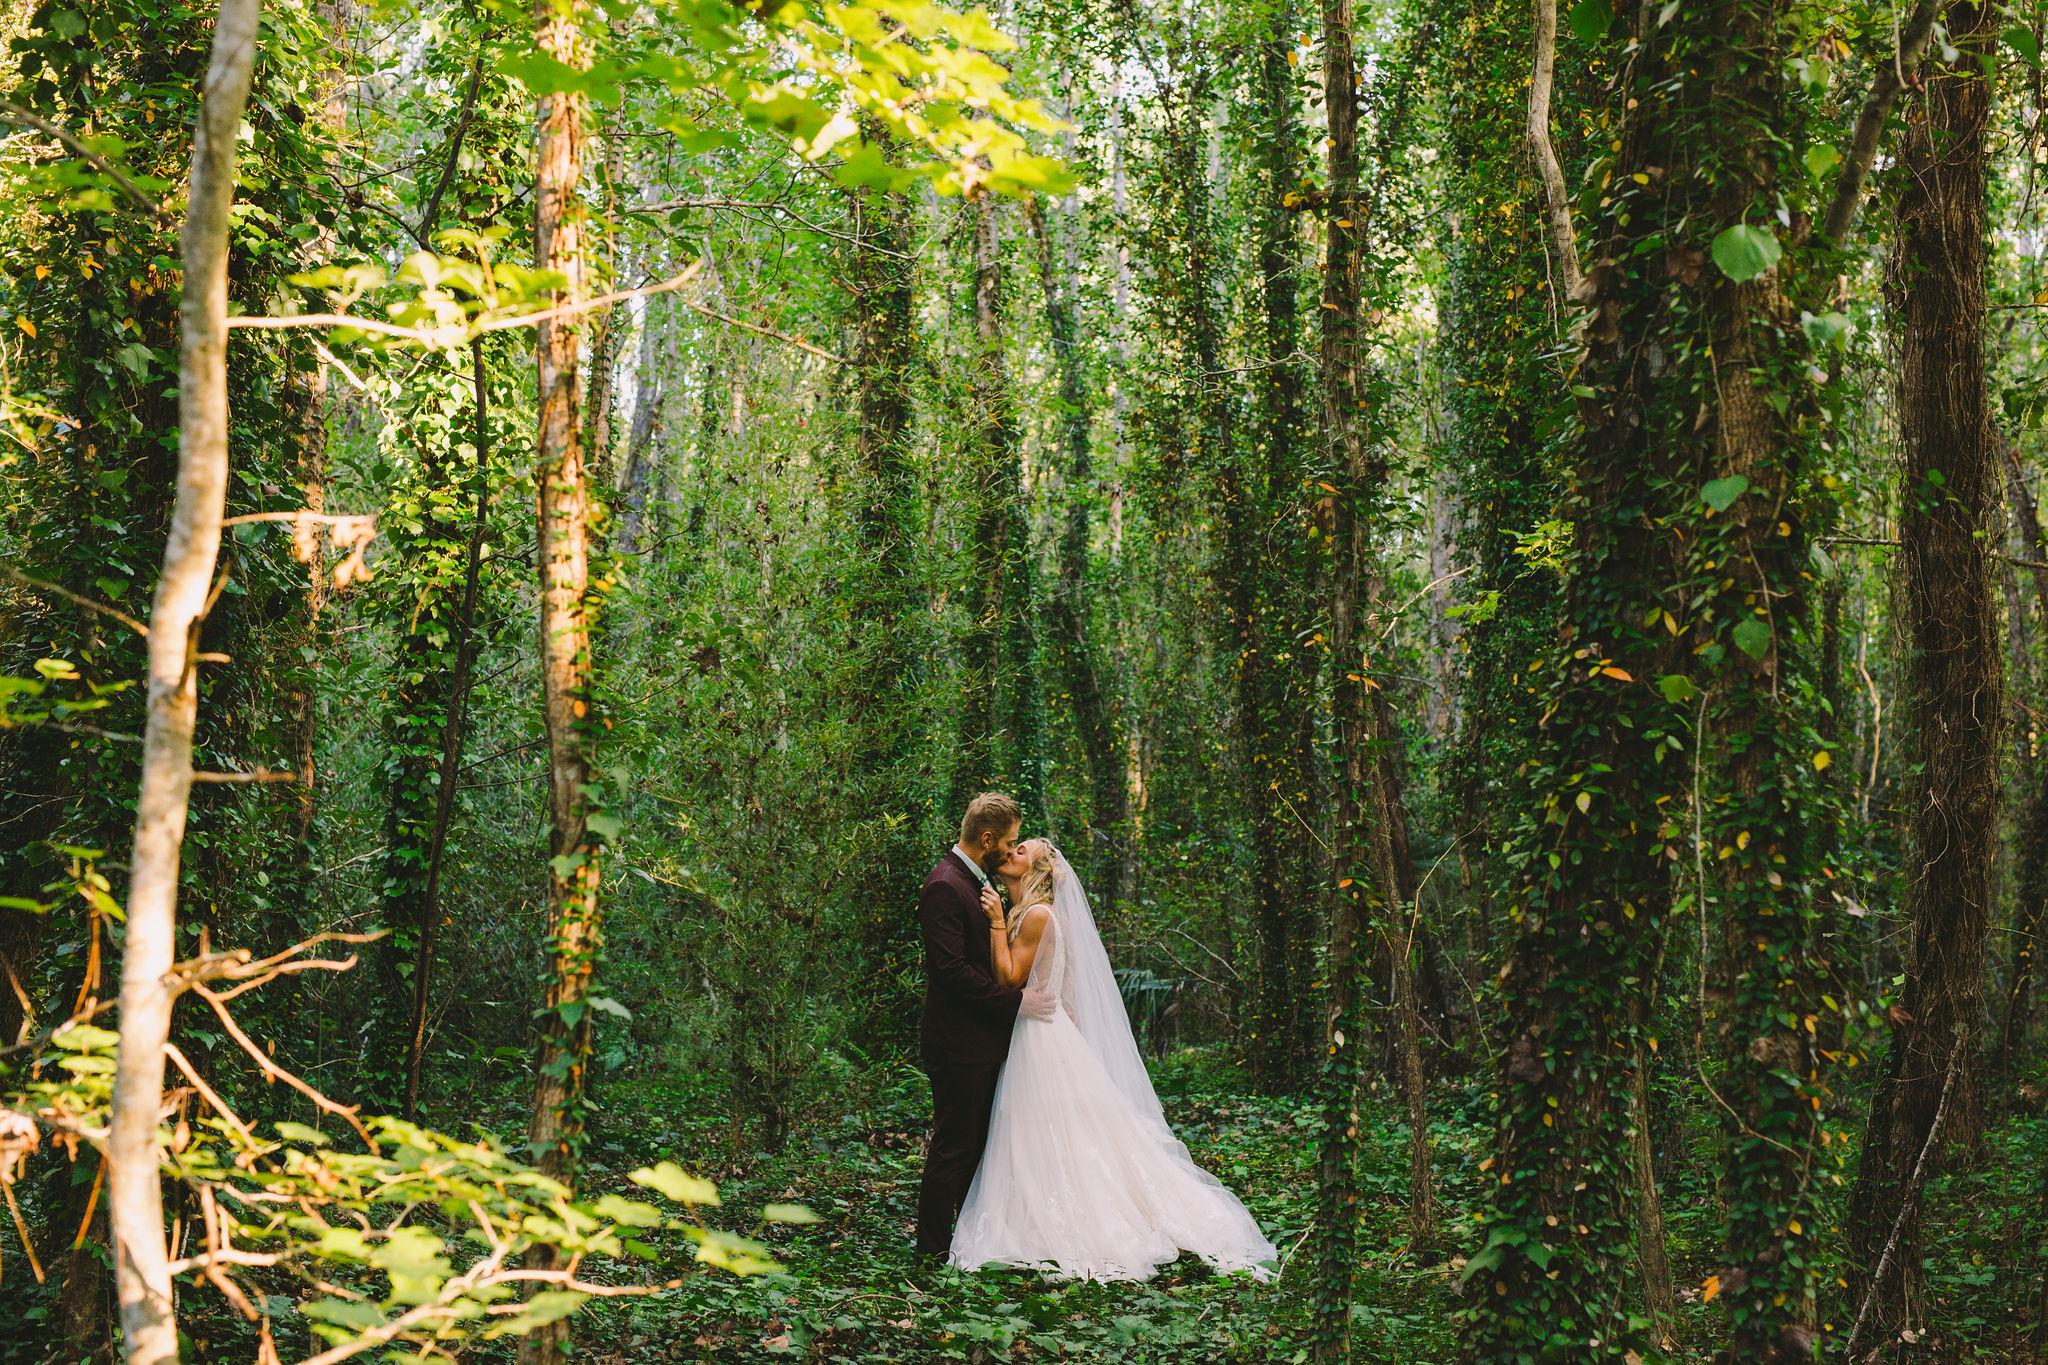 Jesseandlex_181103_AlexisNate_Wedding_BrideGroom_149.jpg